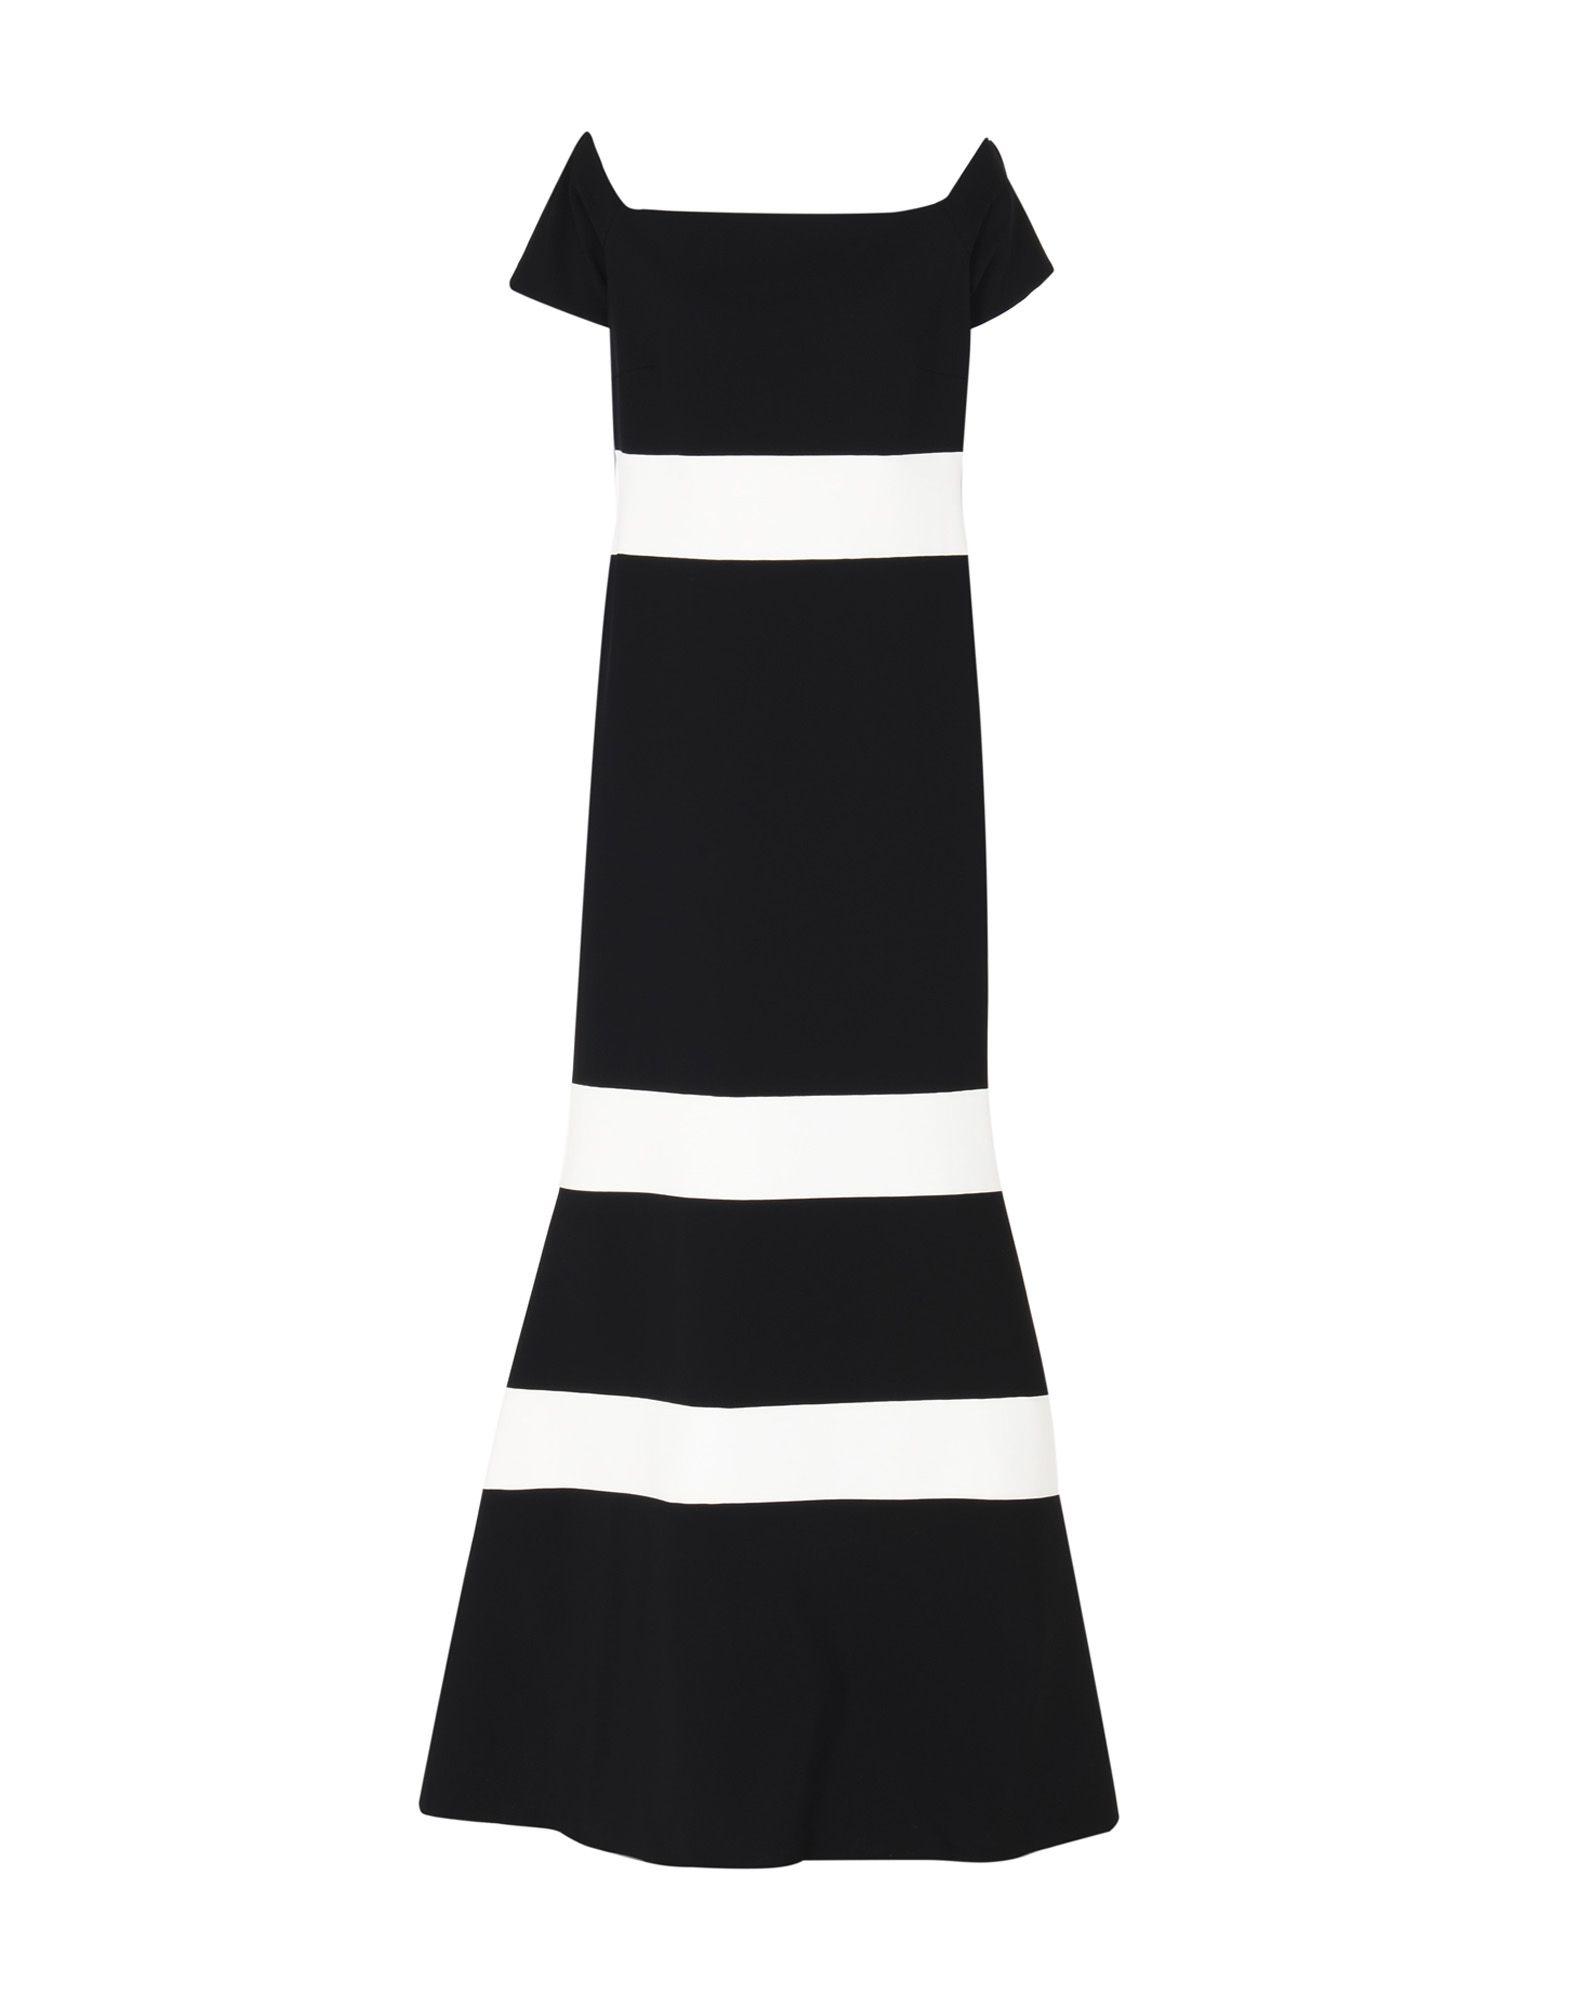 CHIARA BONI Long Dress in Black